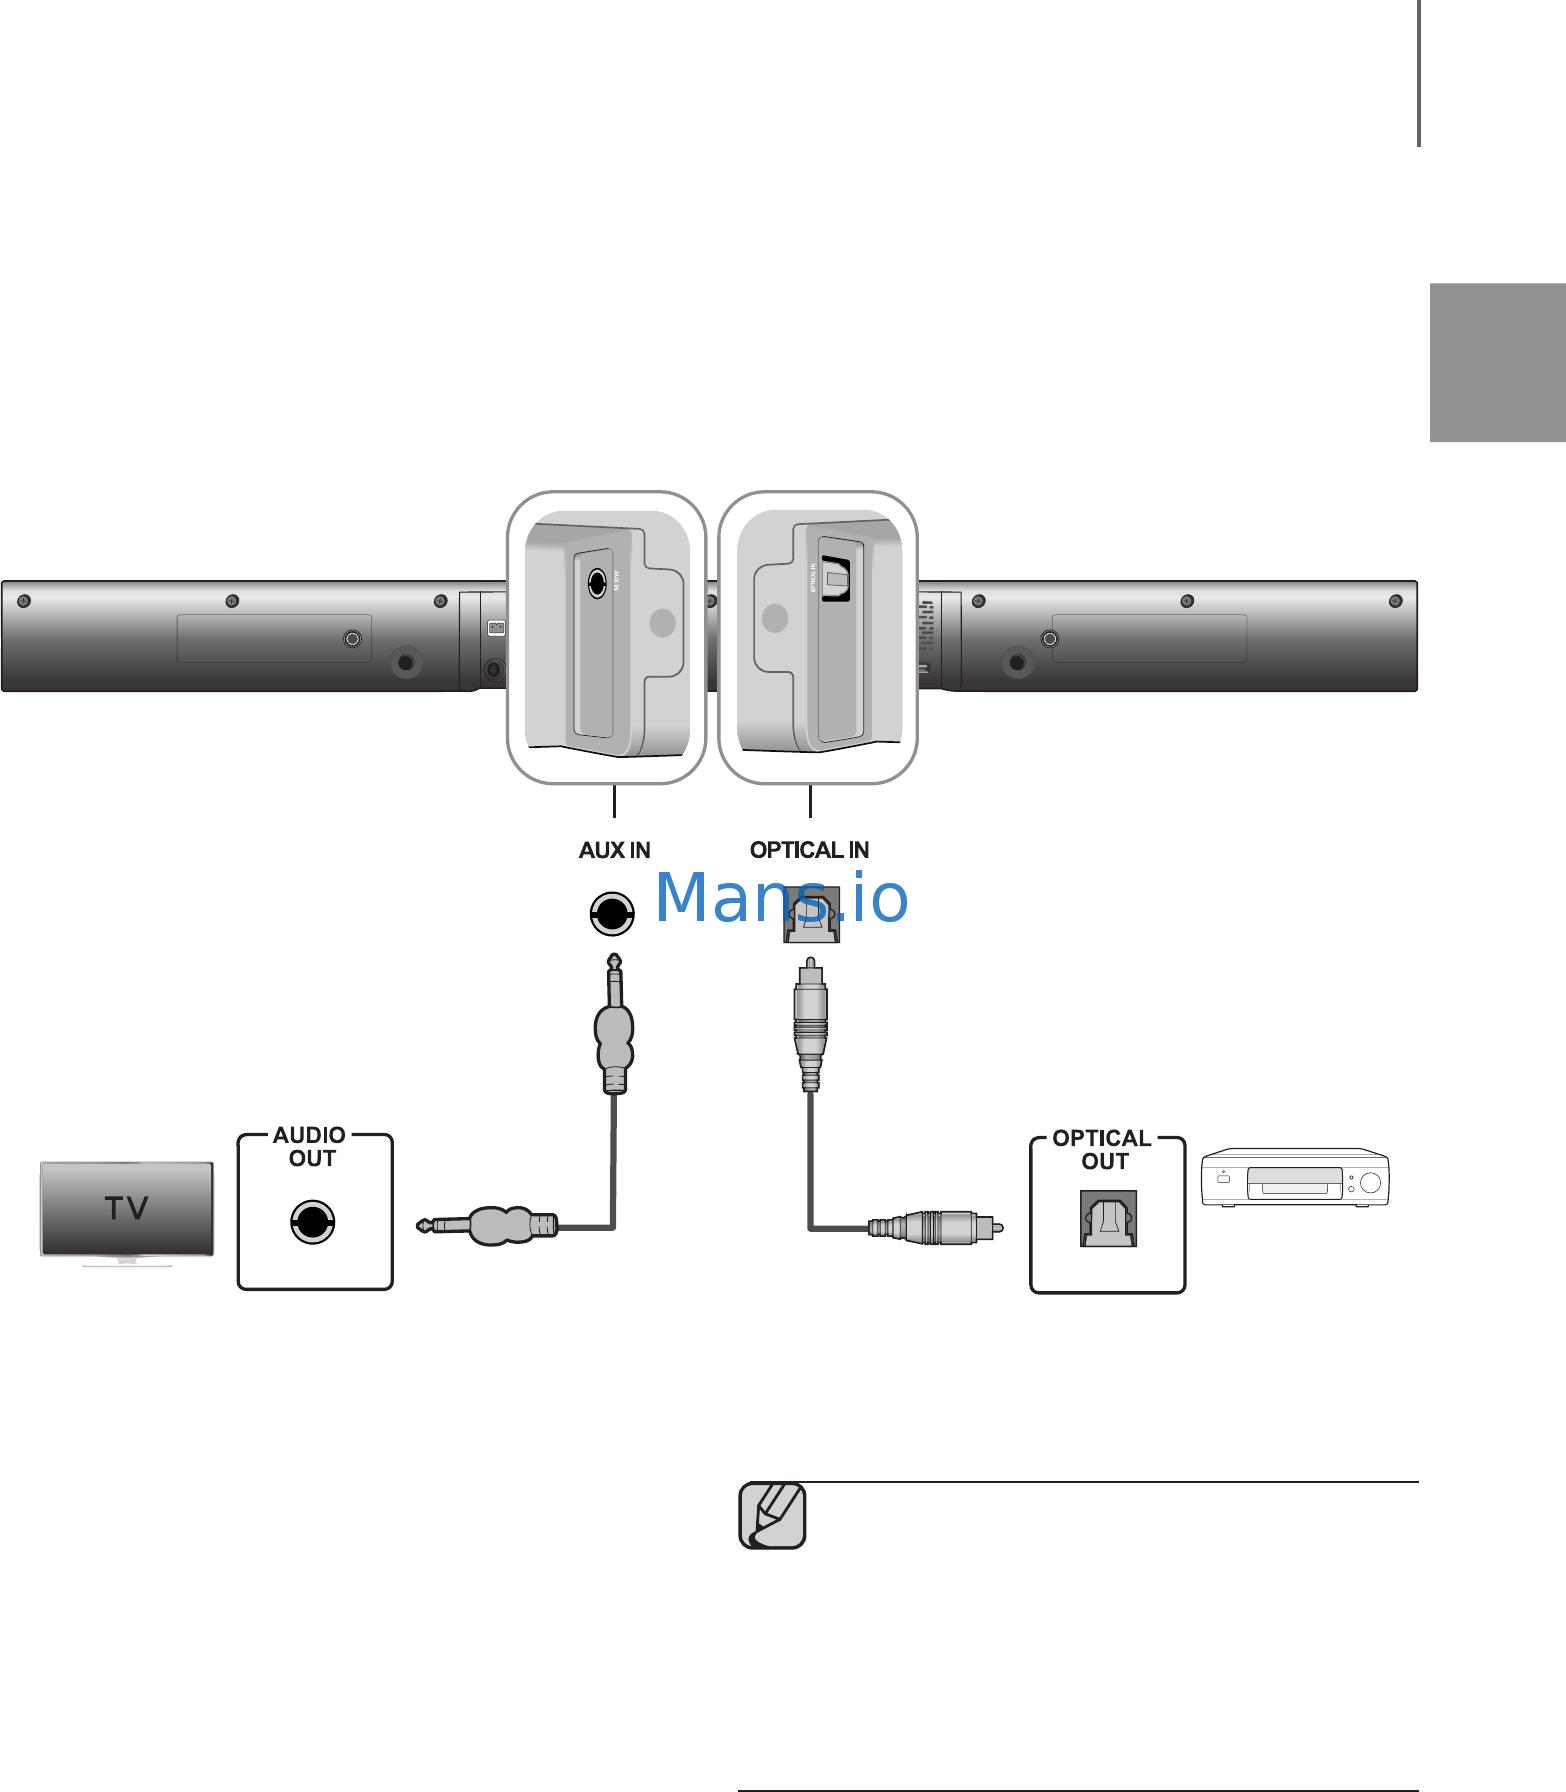 samsung soundbar hw j355 manual